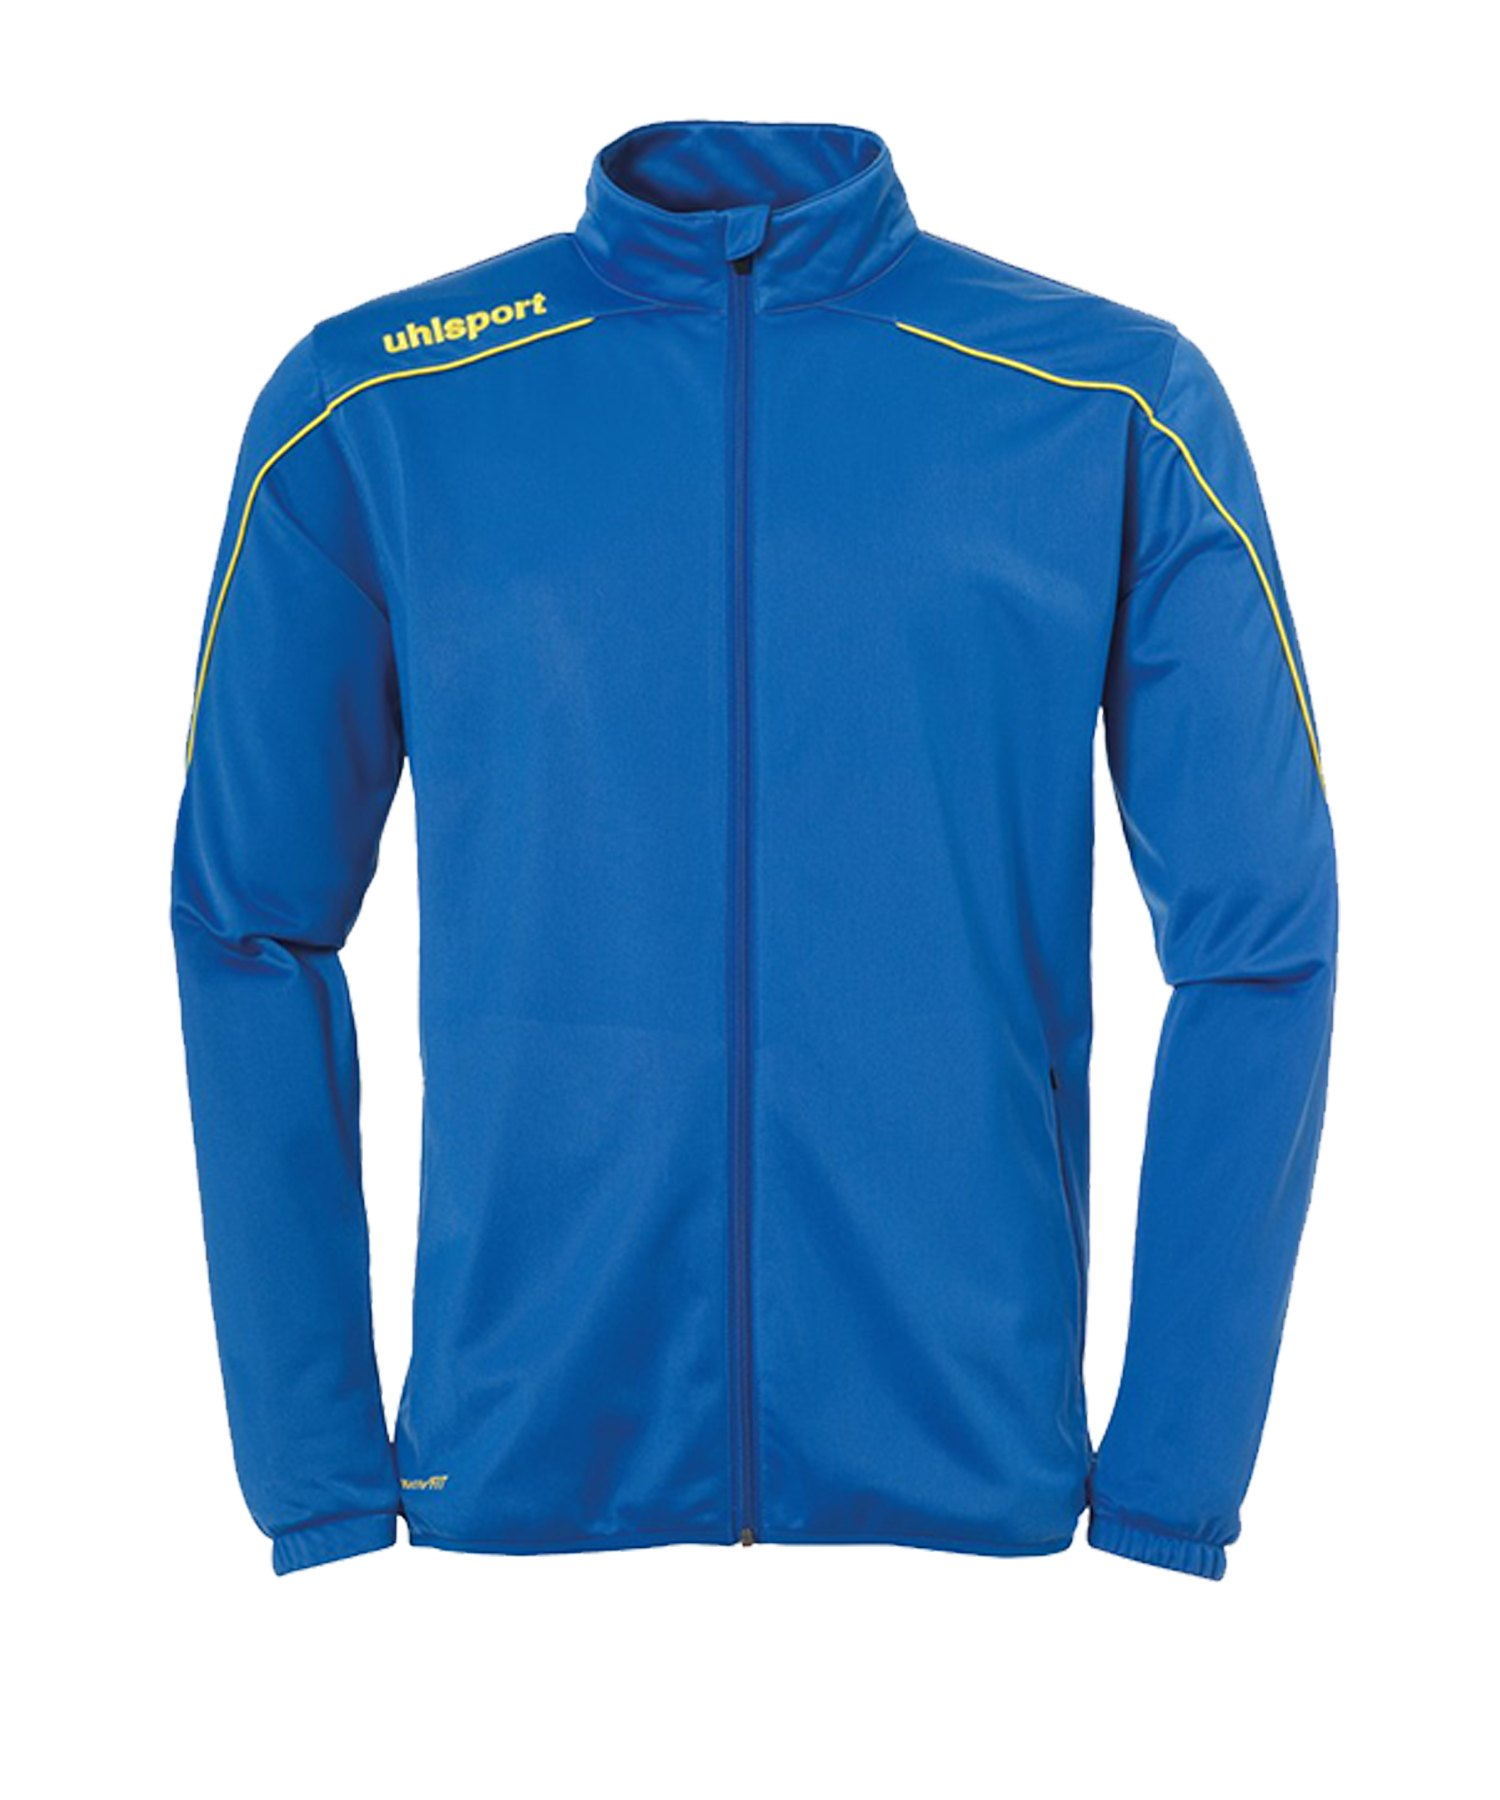 Uhlsport Stream 22 Trainingsjacke Classic Blau F14 - Blau